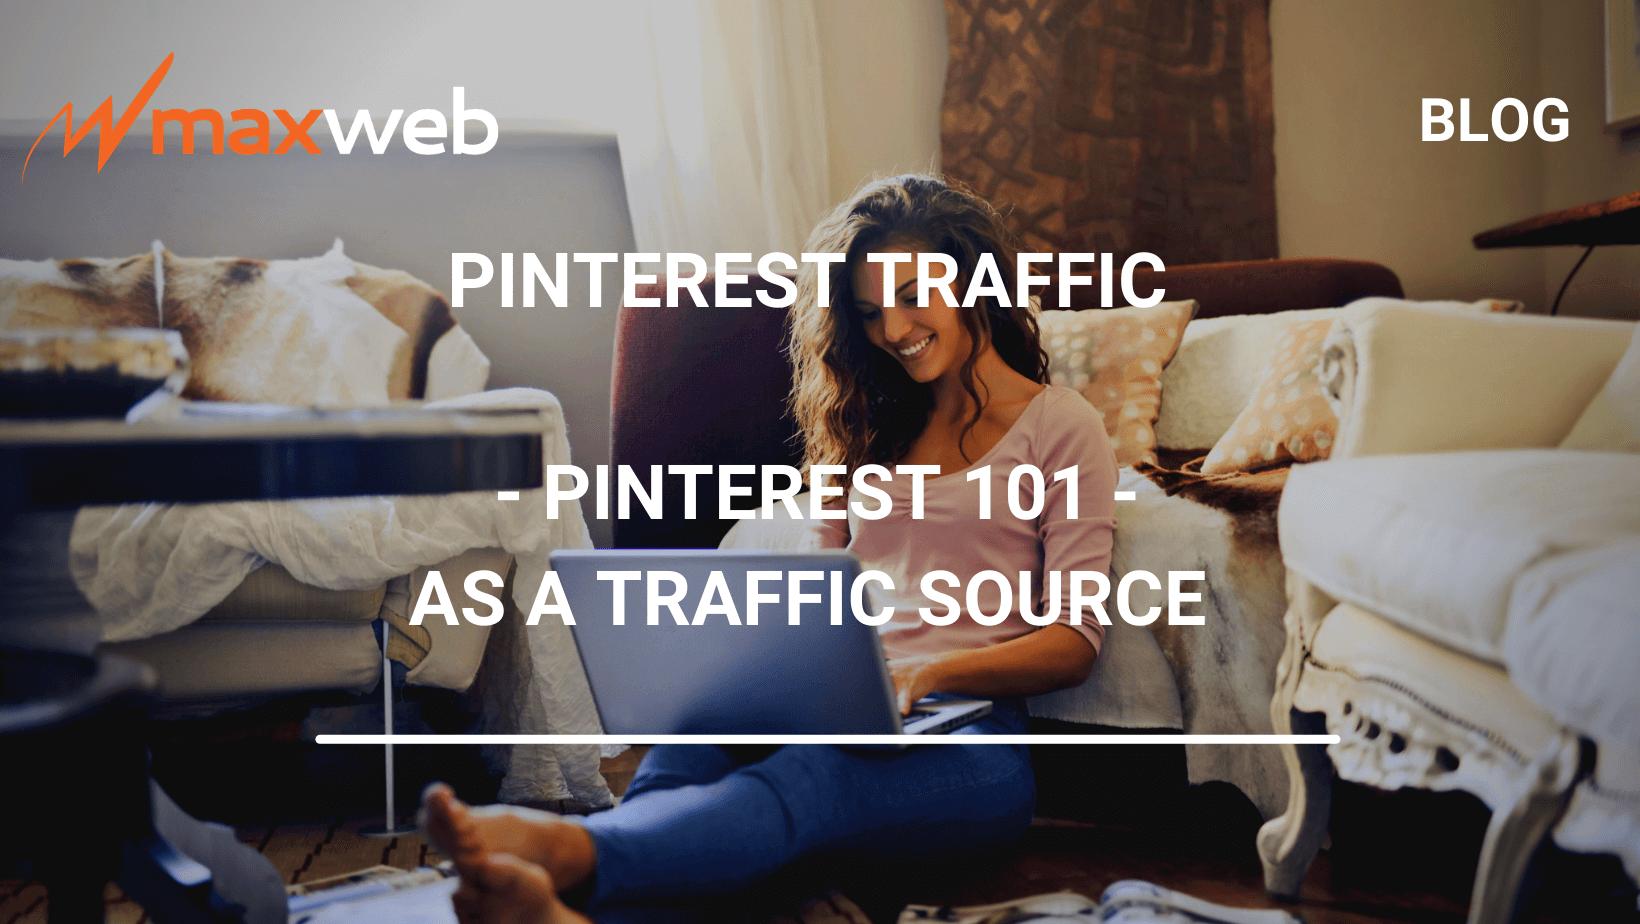 Pinterest 101 as a Traffic Source